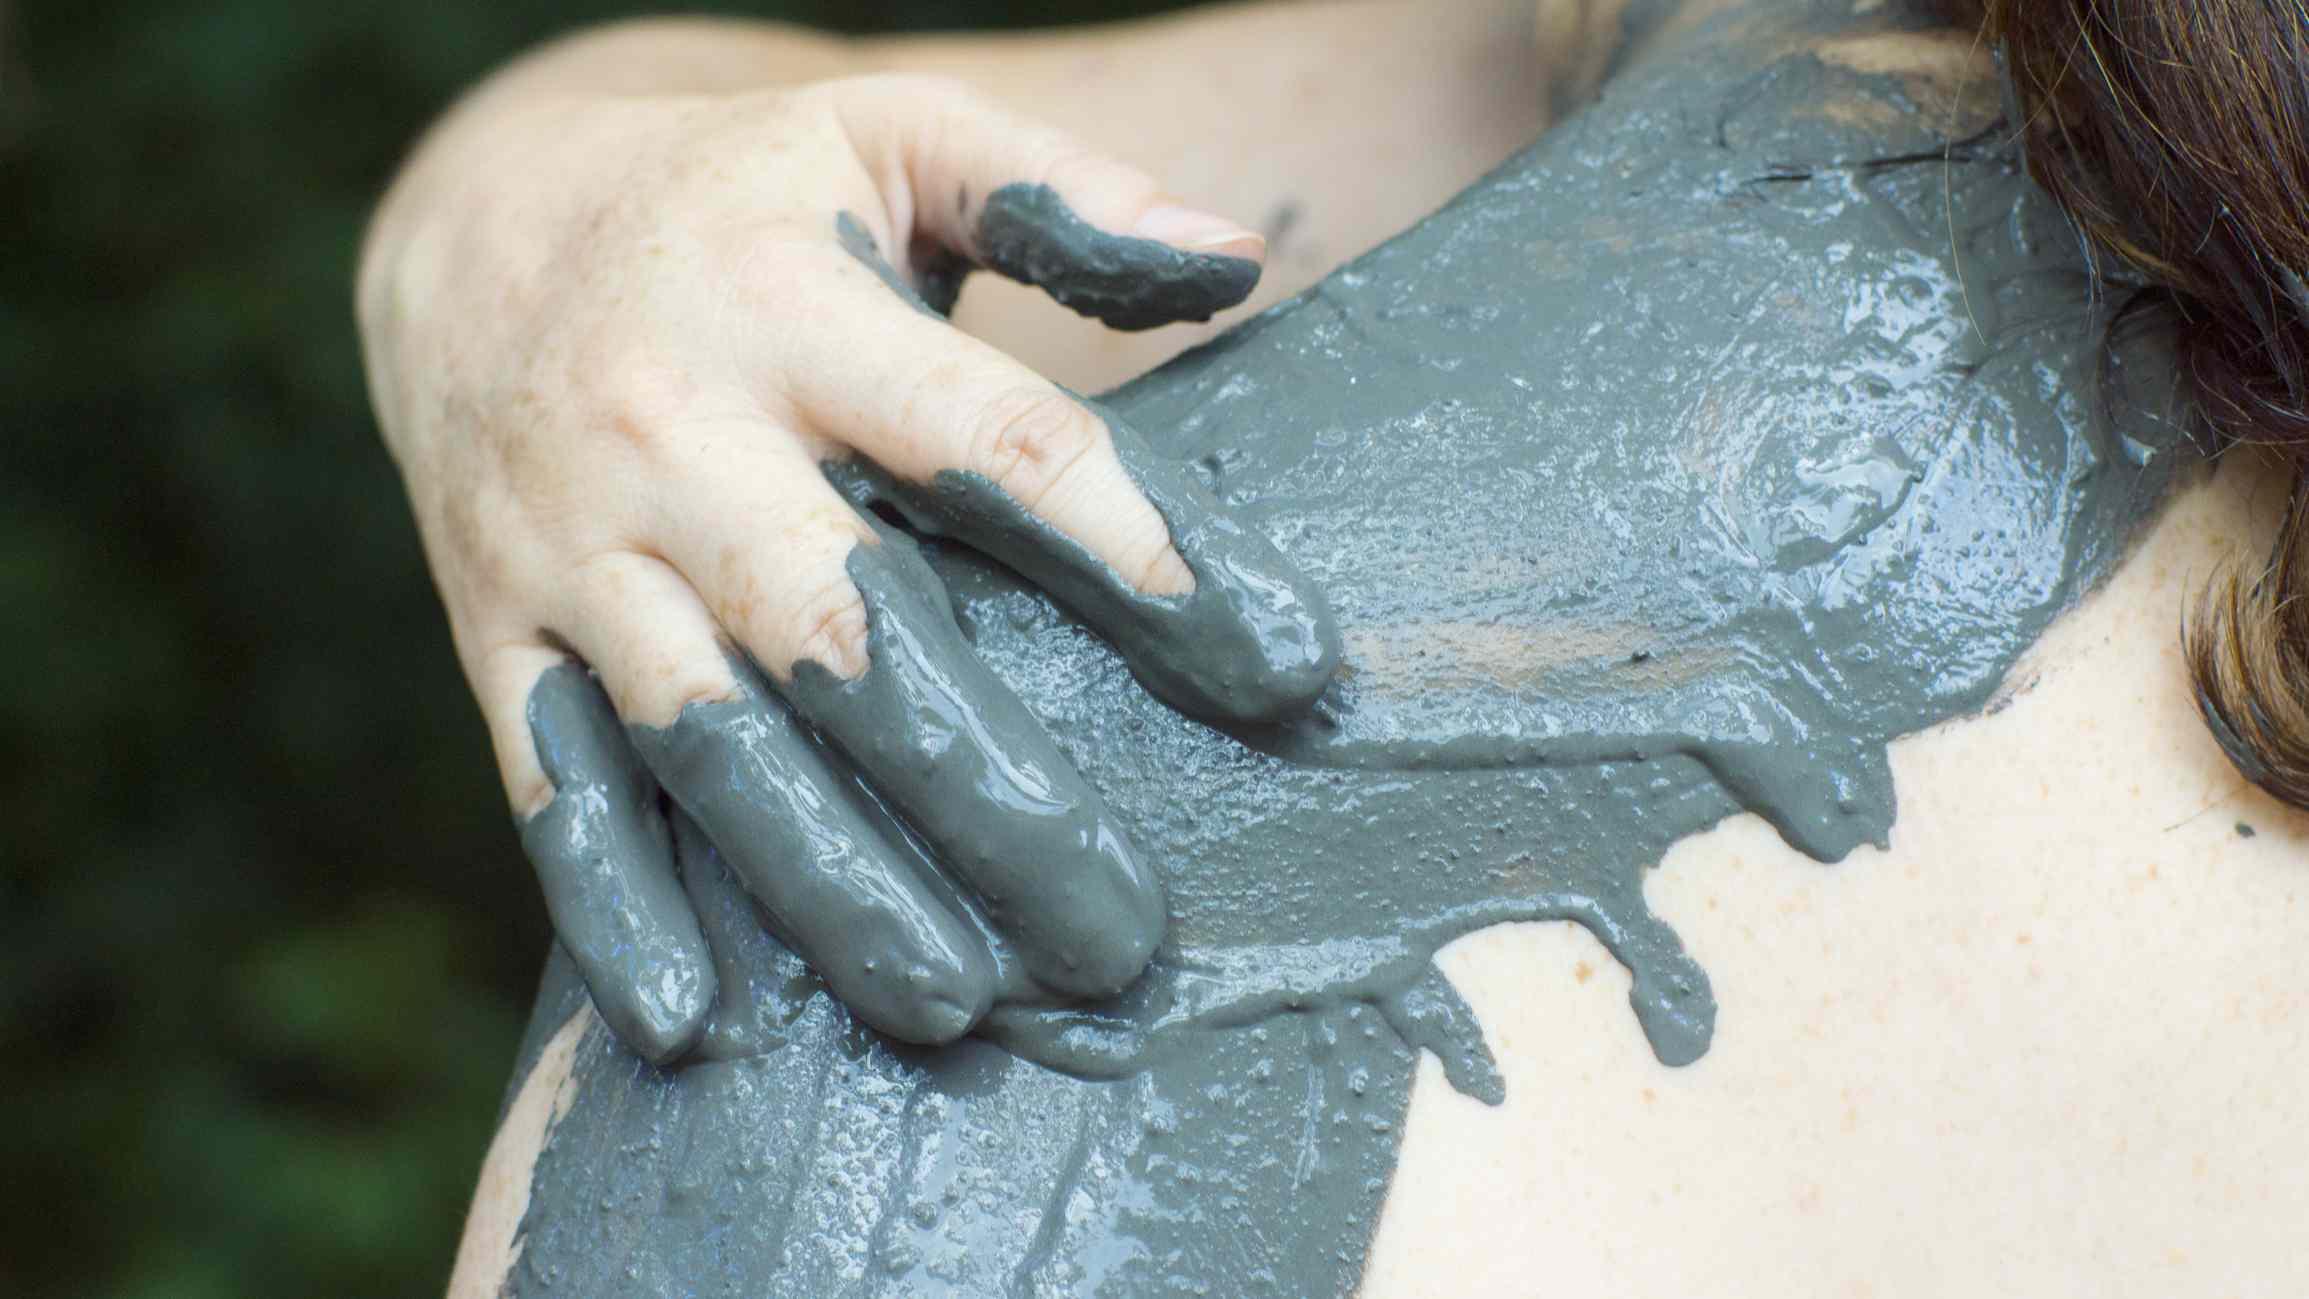 Woman applying mud to shoulder